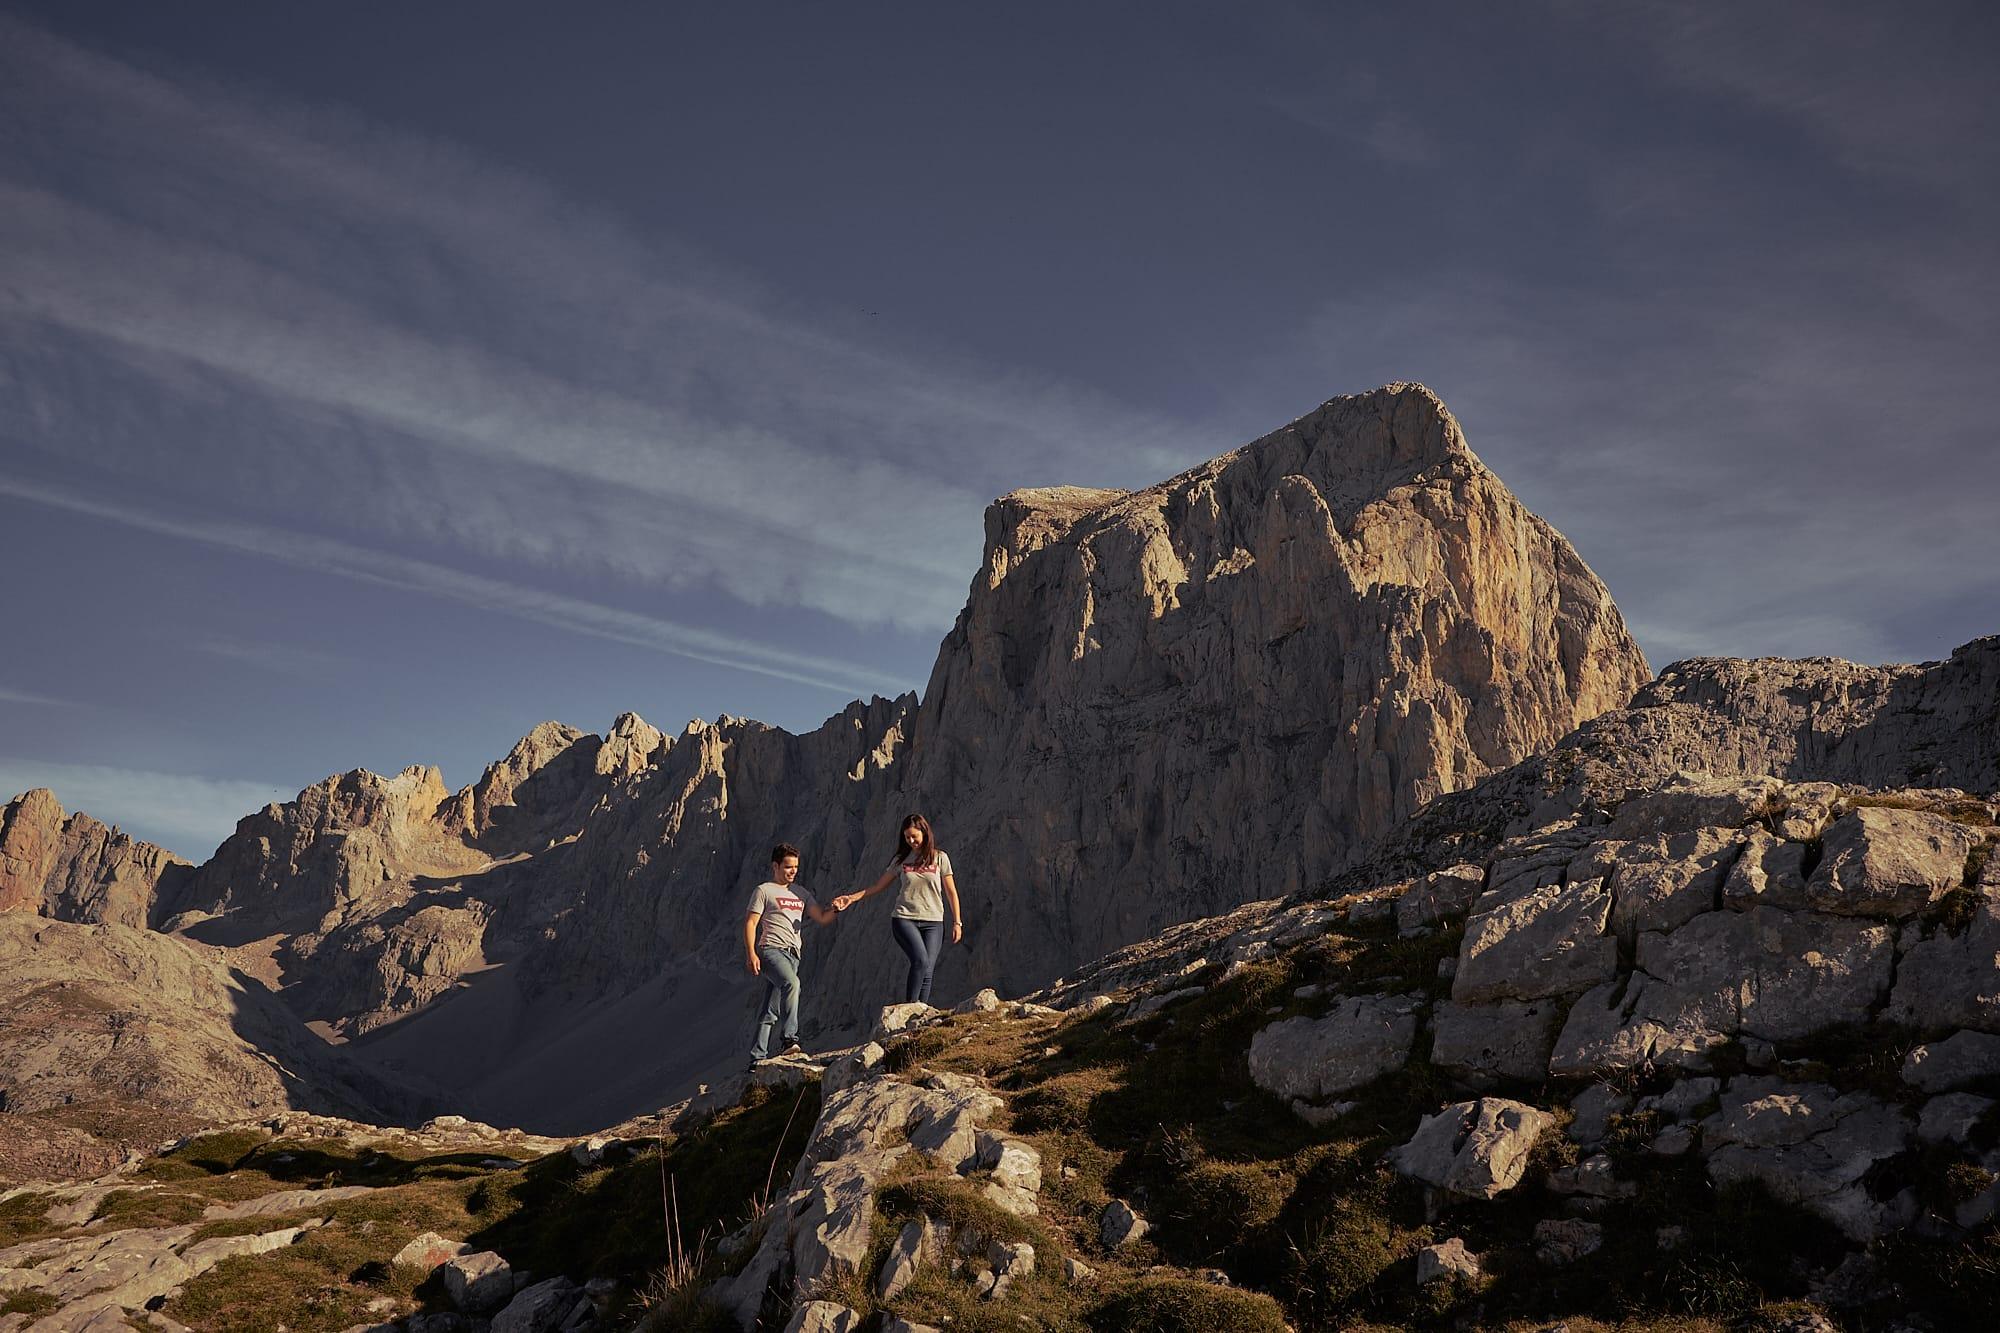 preboda en picos de europa con mar de nubes